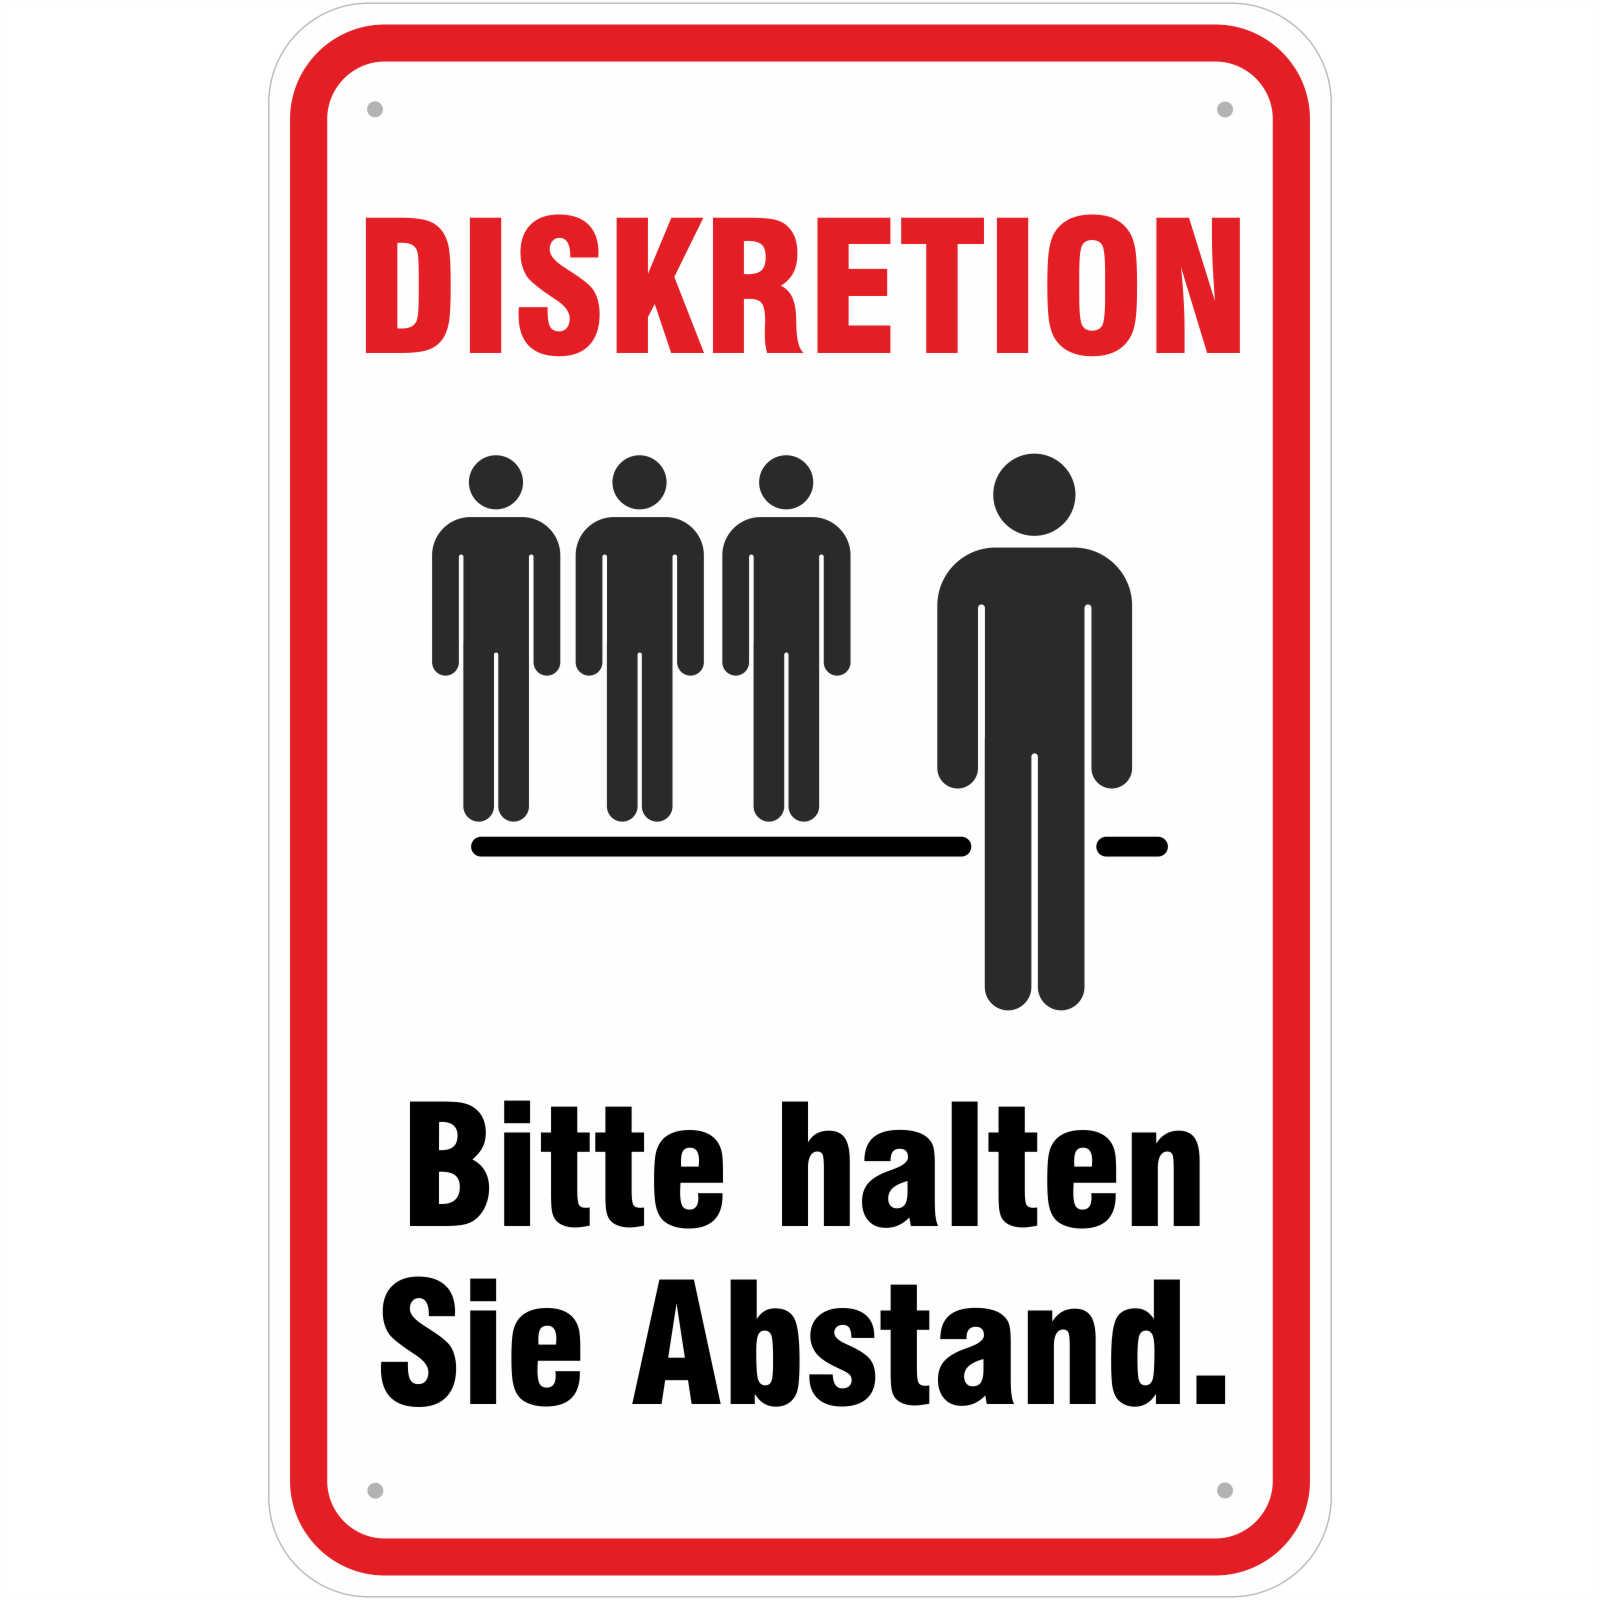 Diskredition